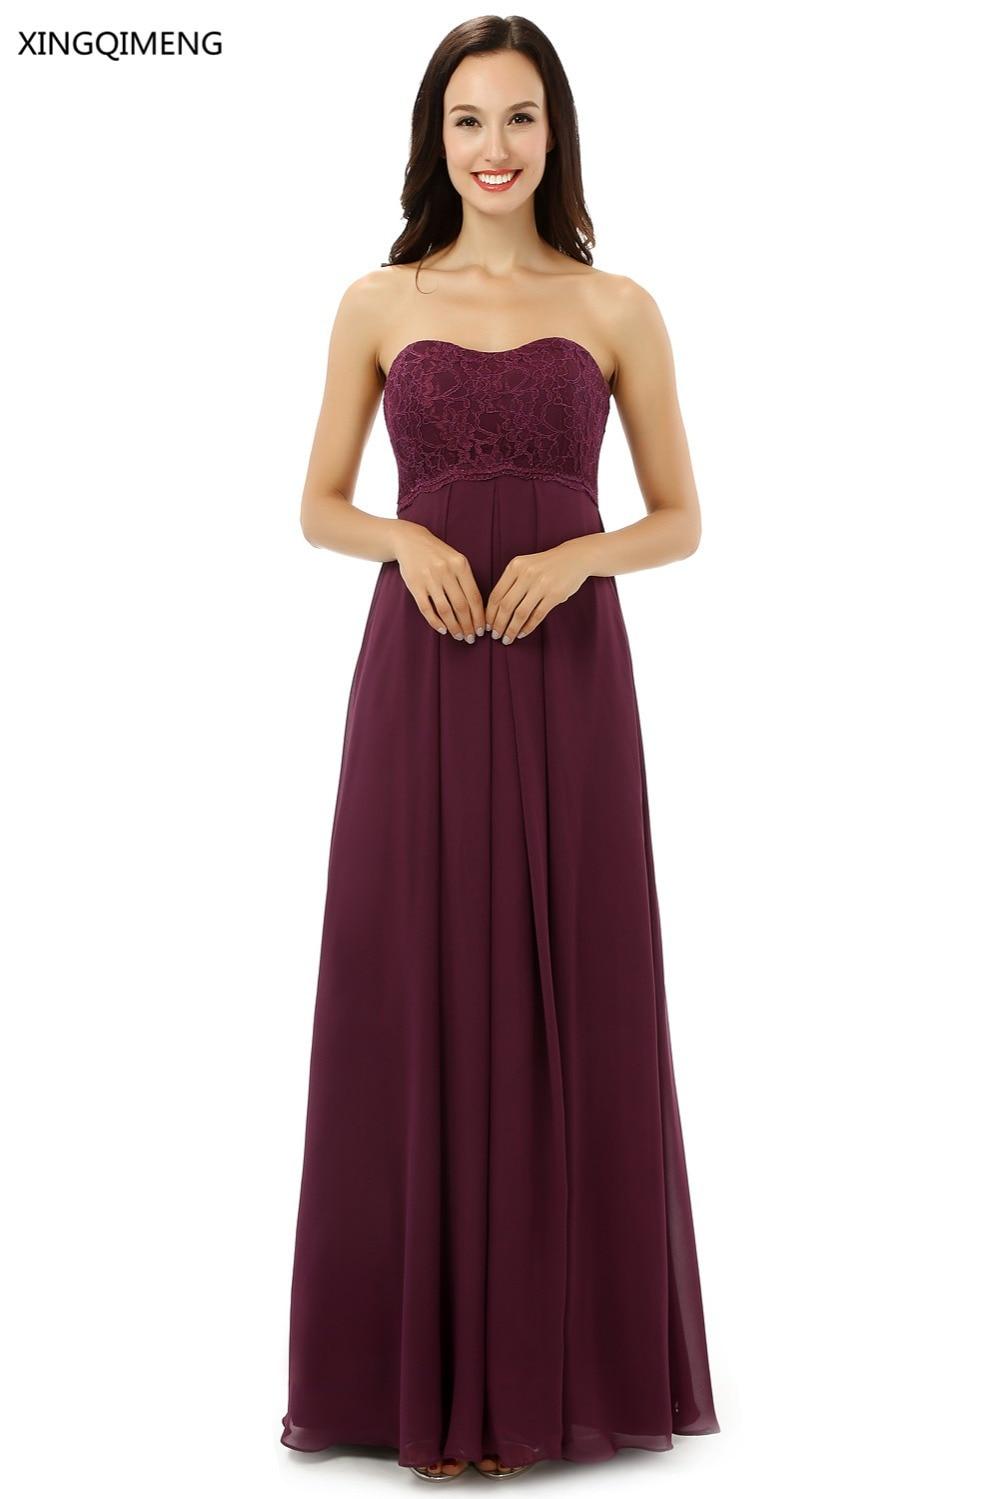 Buy cheap strapless floor length chiffon coral bridesmaid dress - Bridesmaid Dresses 2017 Coral Burgundy Mint Navy Color Floor Length Off The Shoulder Chiffon Vestido Madrinha